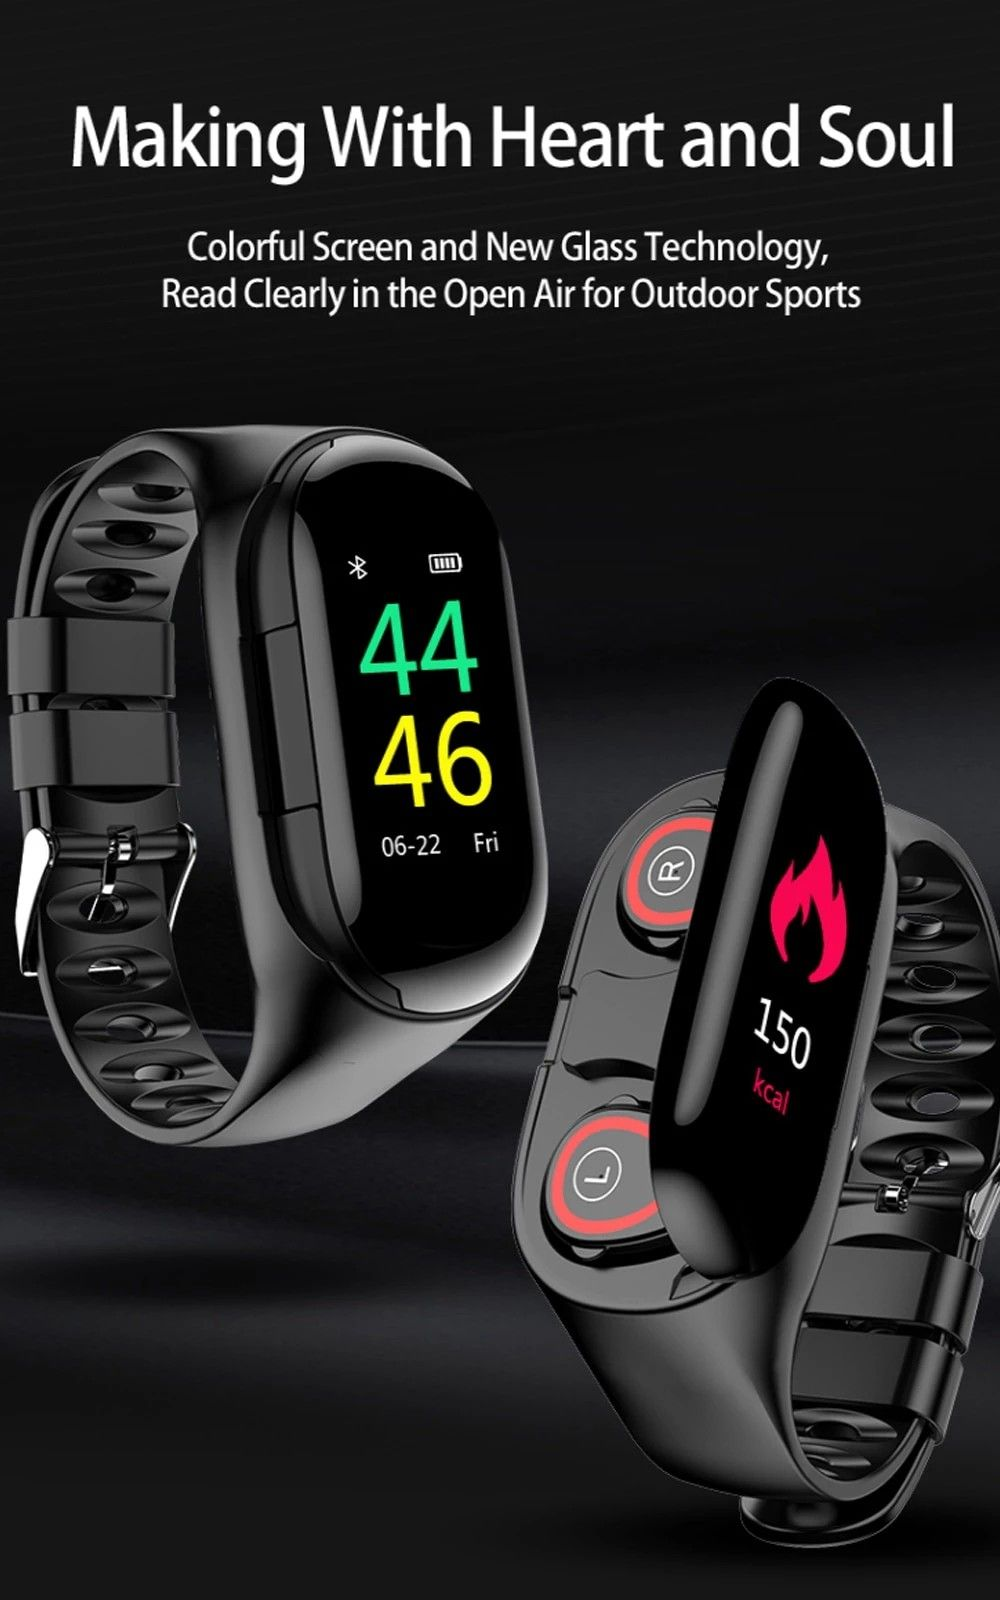 Wear on your Wrist, TWS Bluetooth 5.0 Sports Earphone With